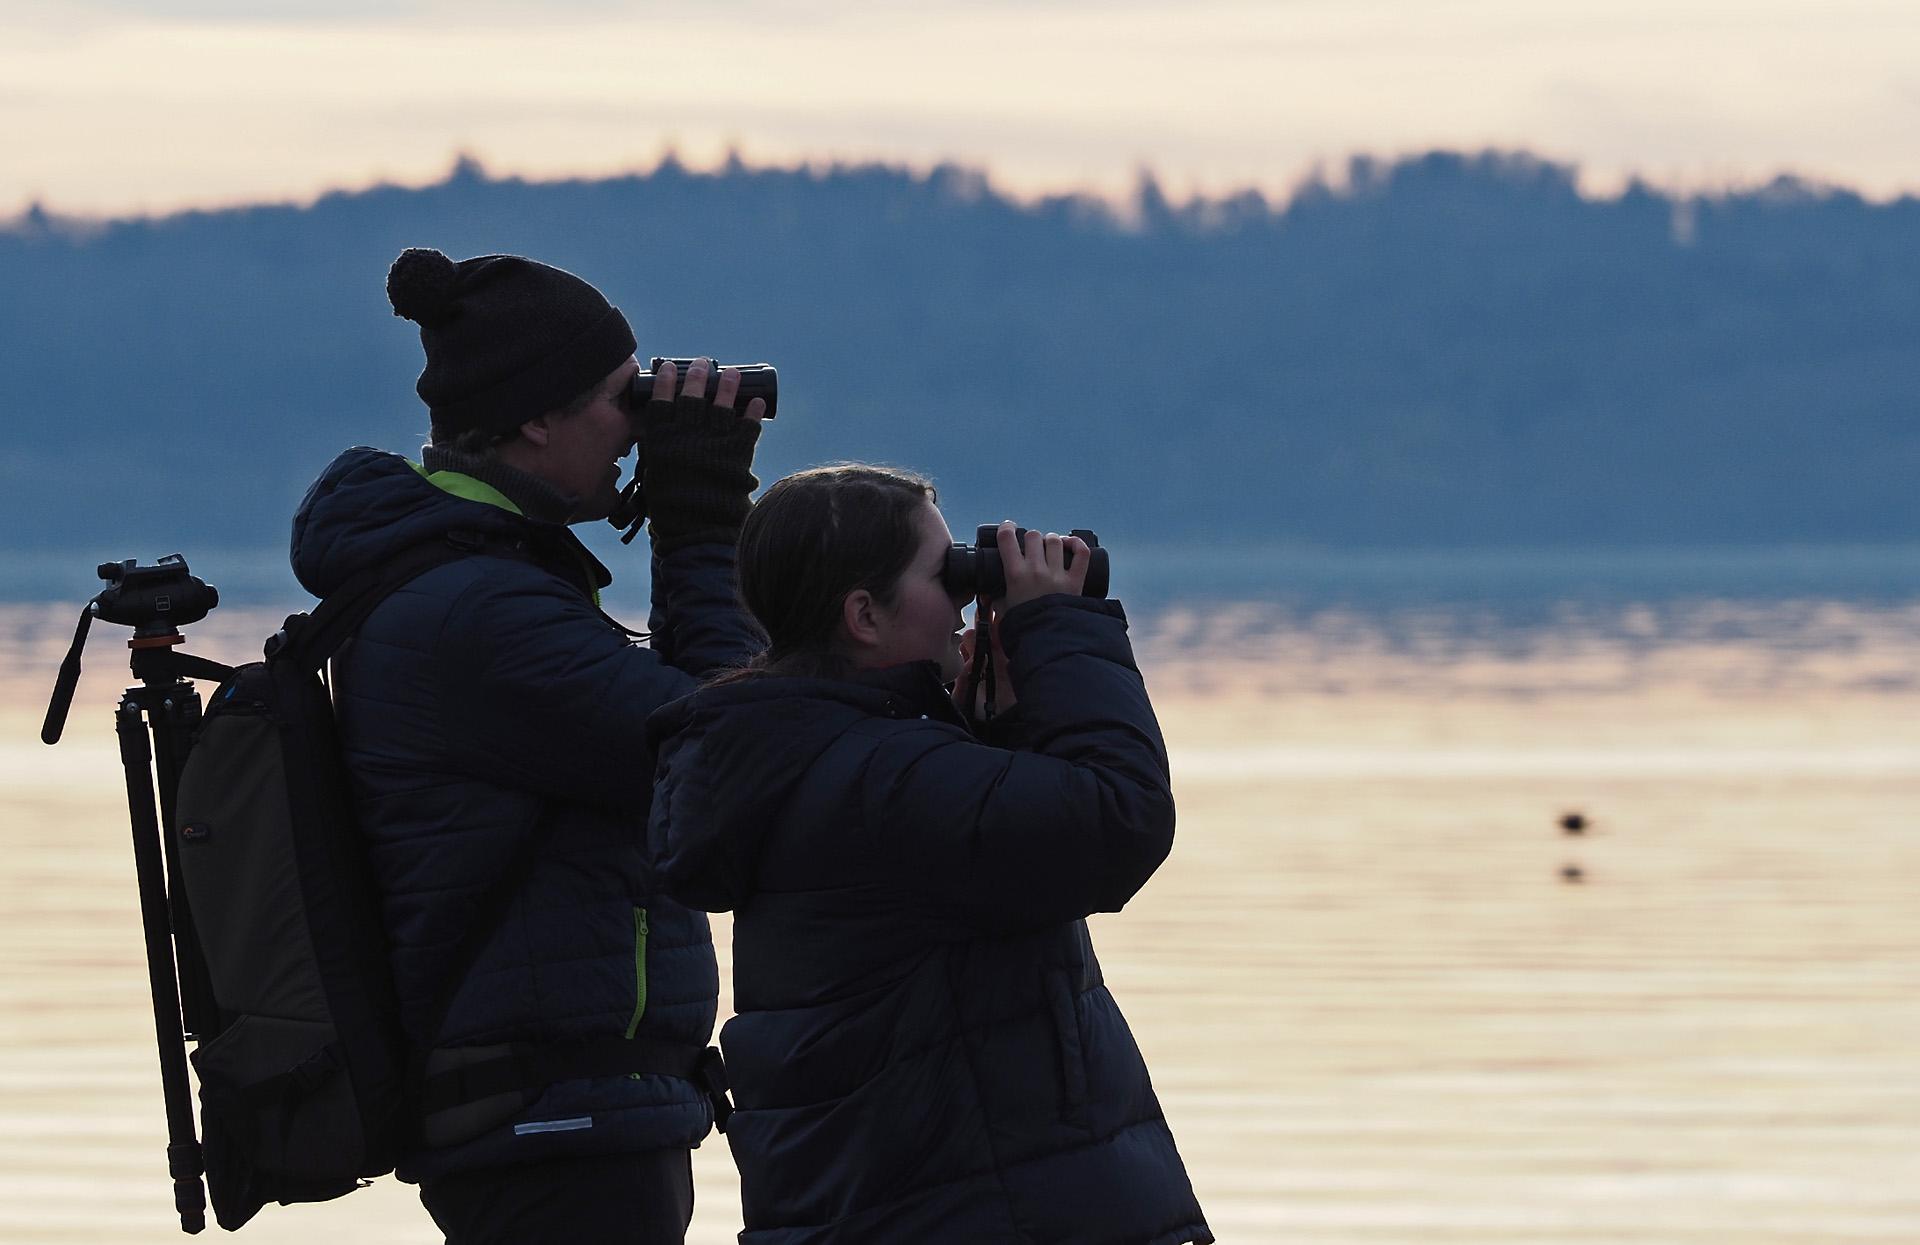 Wasservogelbeobachtung Foto: Bernhard Waurick